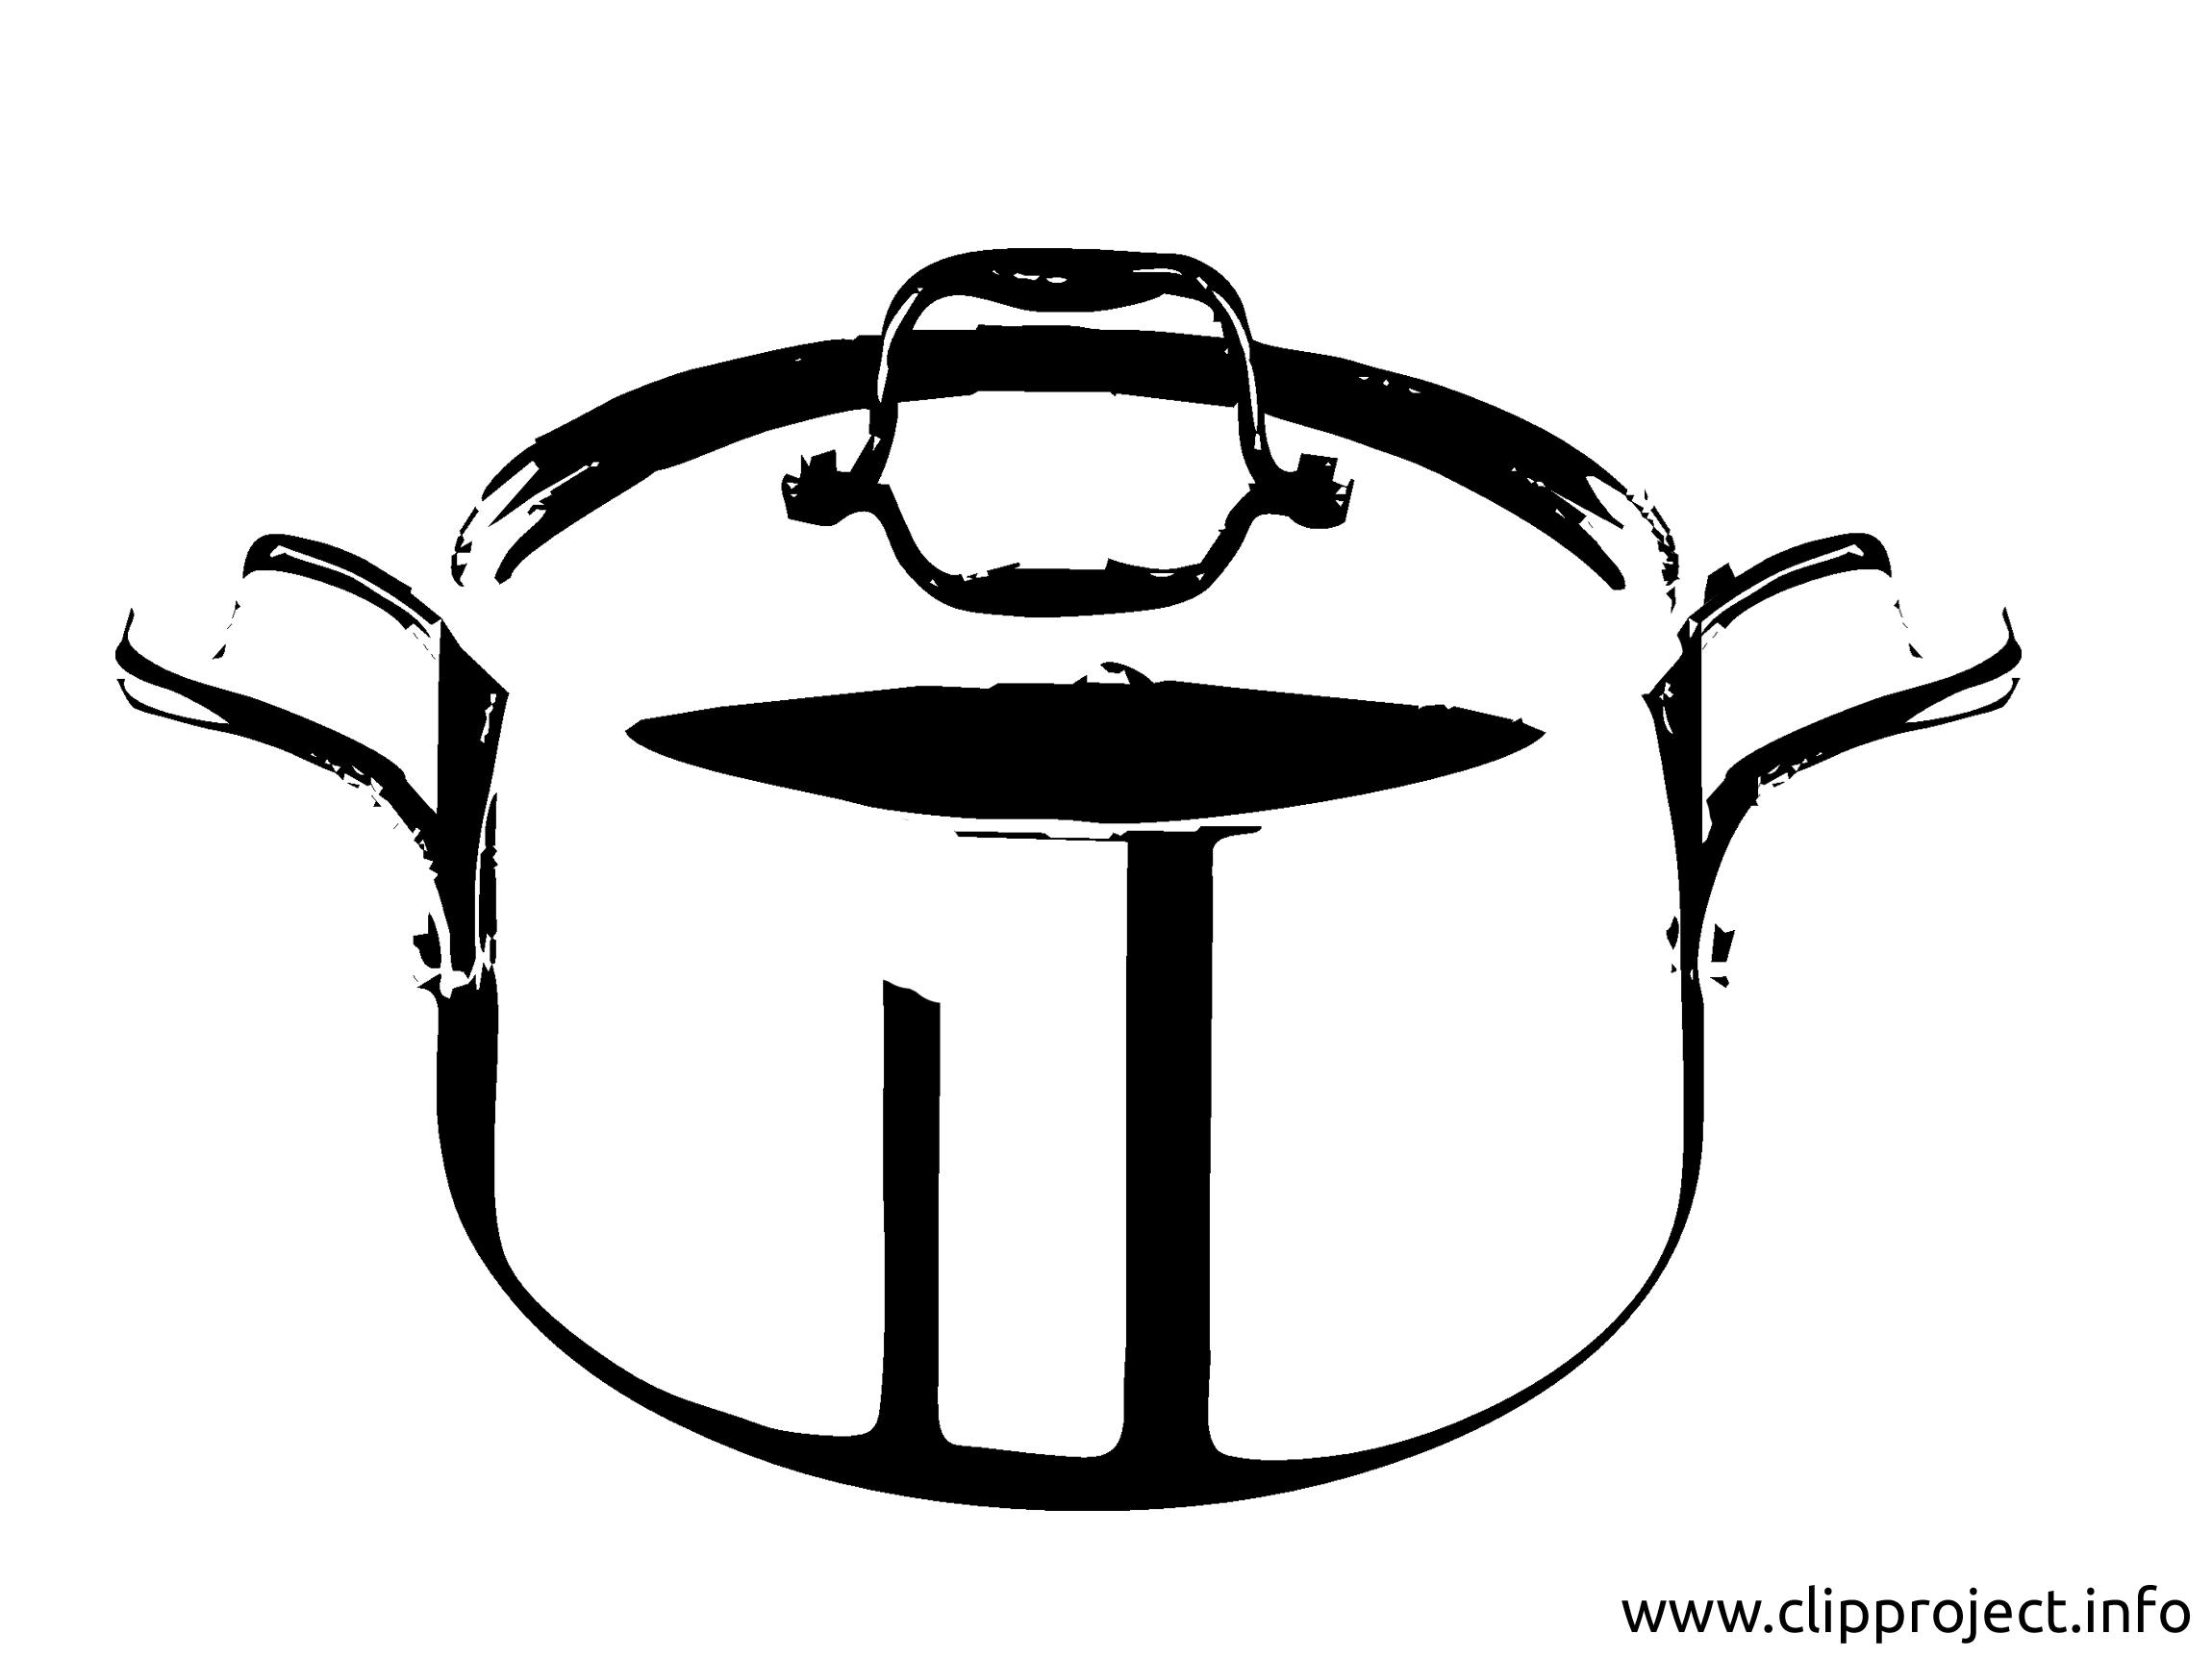 Kochtopf mit deckel clipart image freeuse Clipart kochtopf - ClipartFox image freeuse